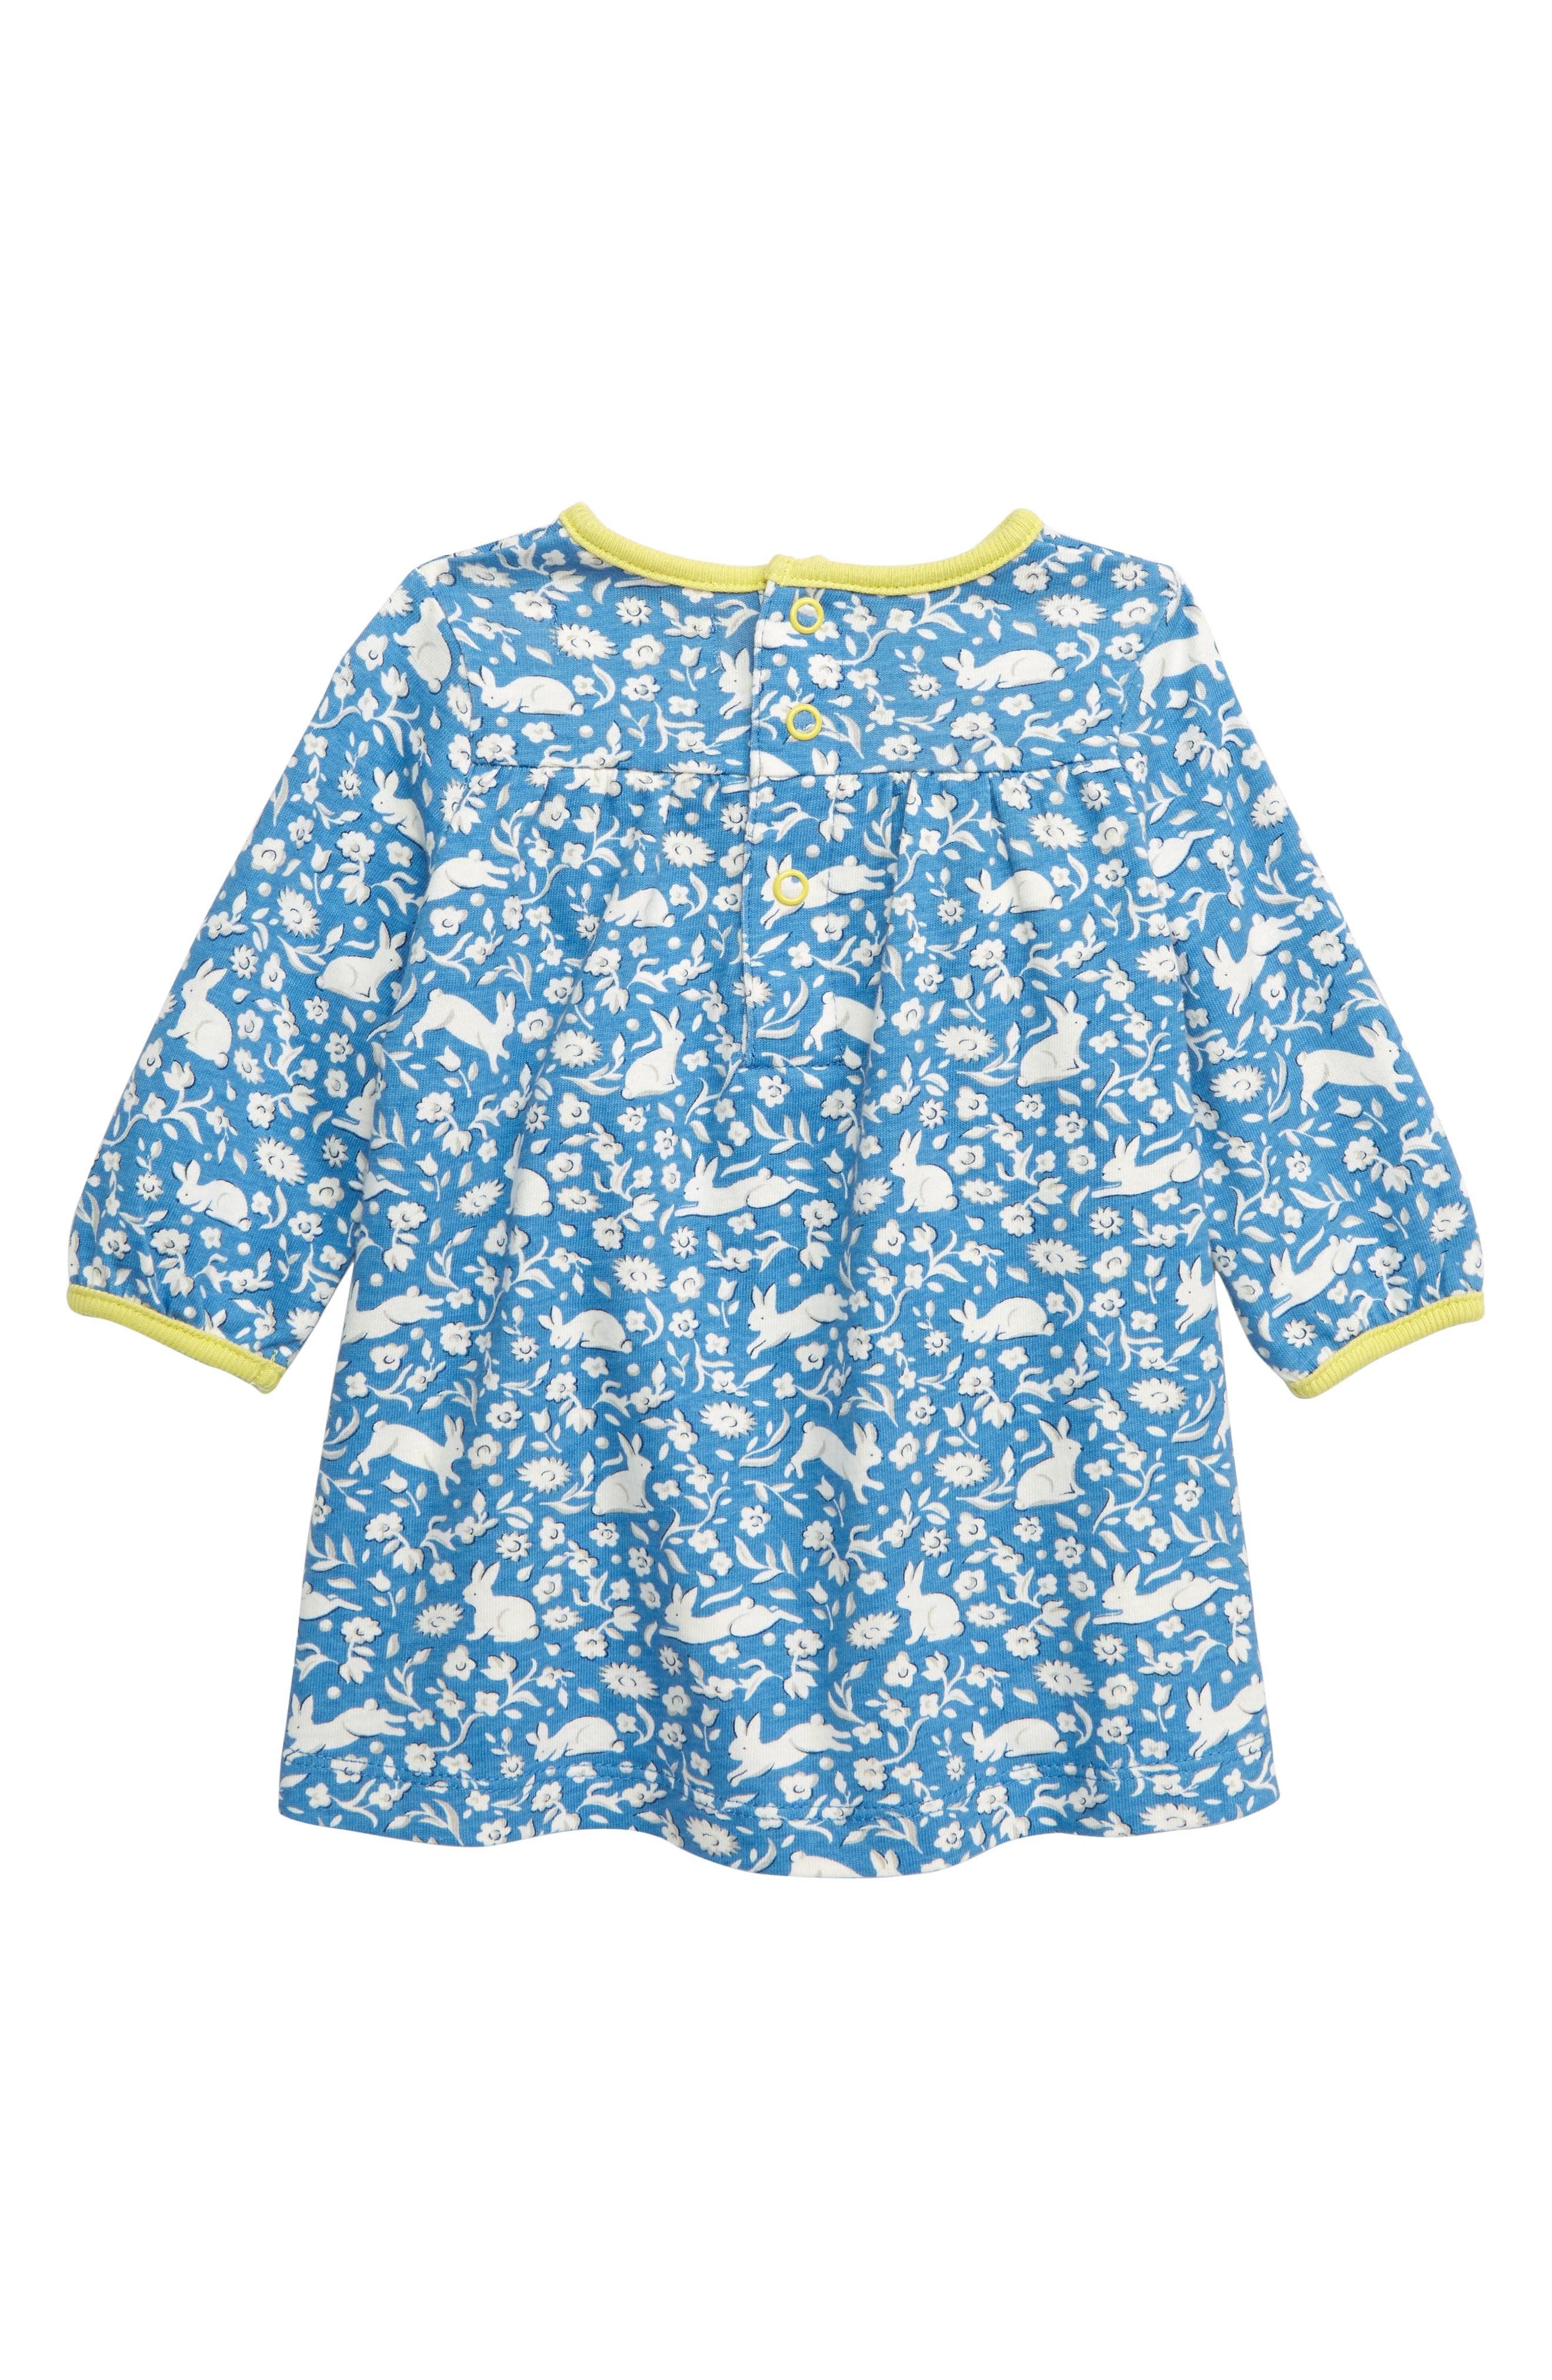 MINI BODEN, Pretty Smocked Jersey Dress, Alternate thumbnail 2, color, ELIZABETH BLUE WILD BUNNIES